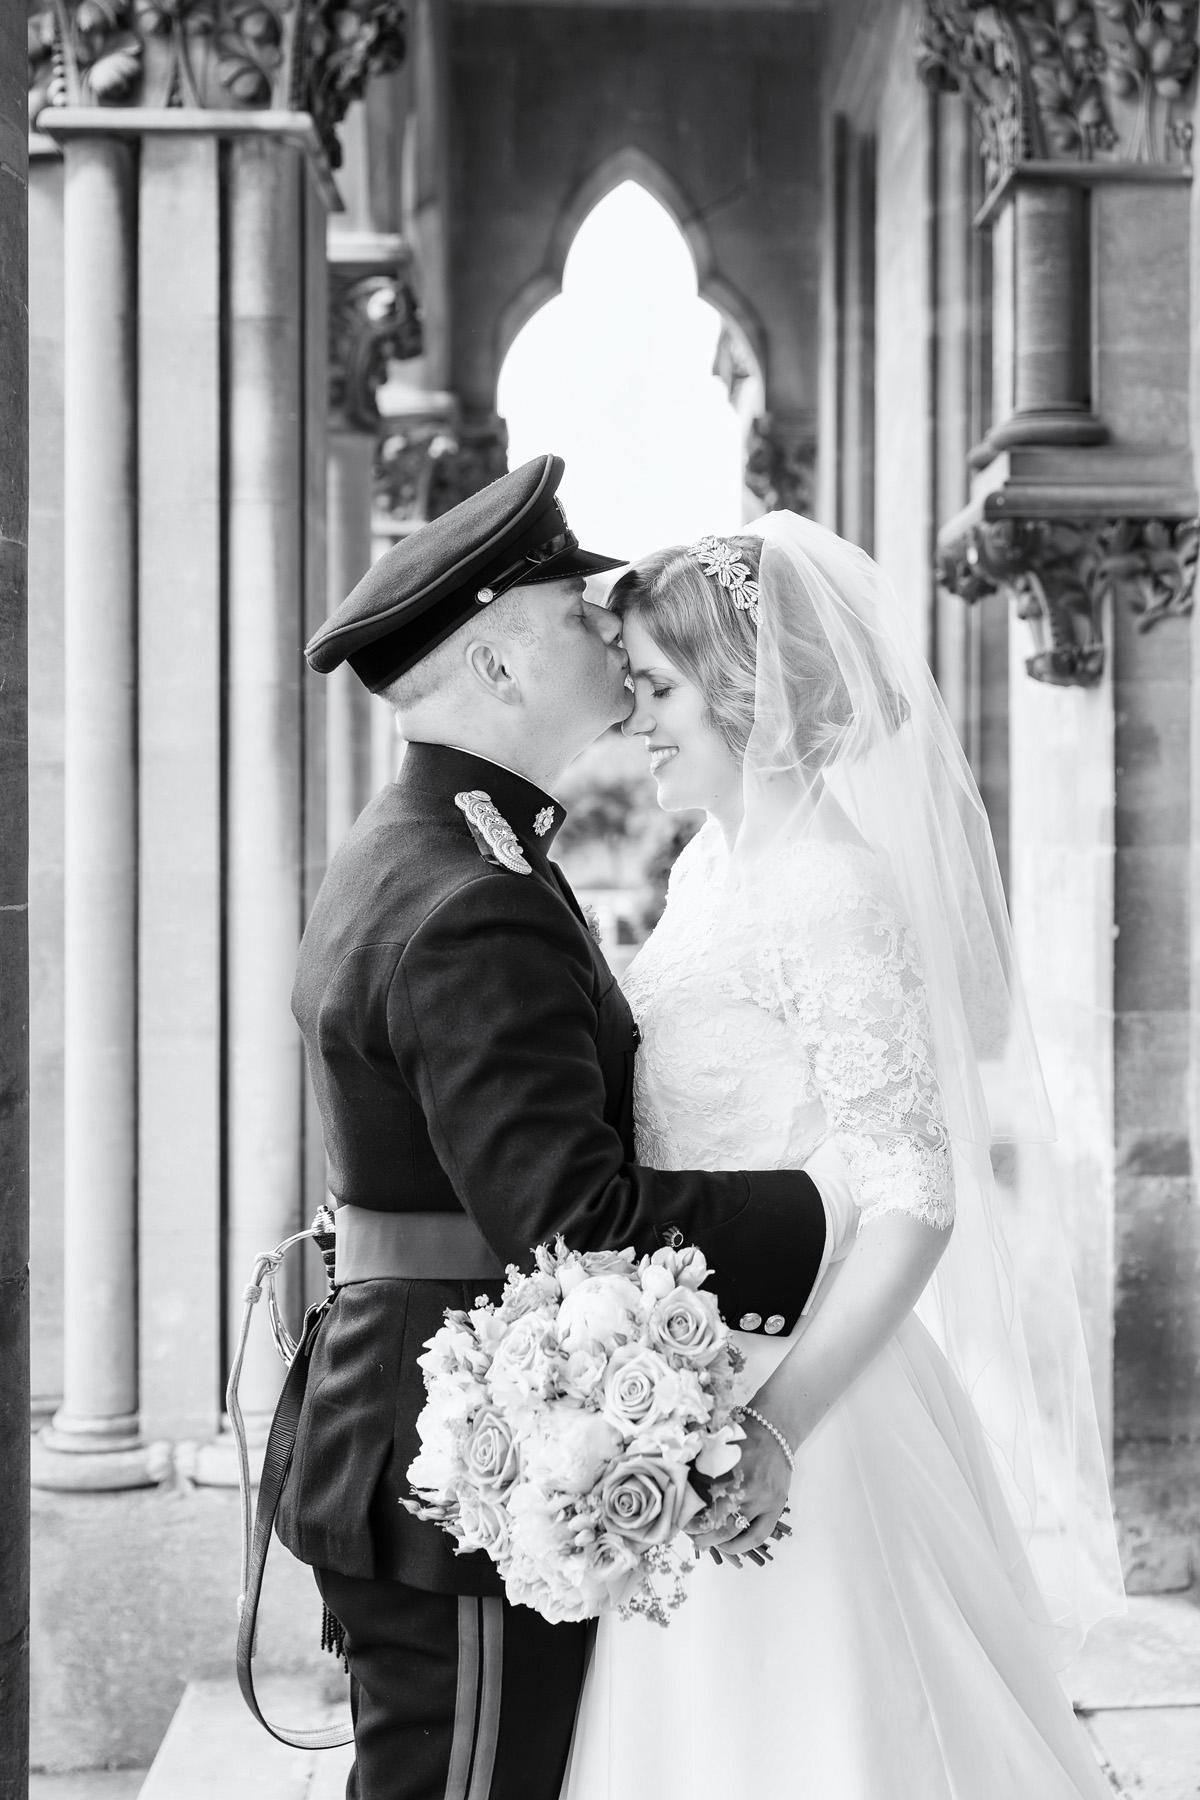 Black & White portrait of Bride & Groom in military uniform - at Walton Hall